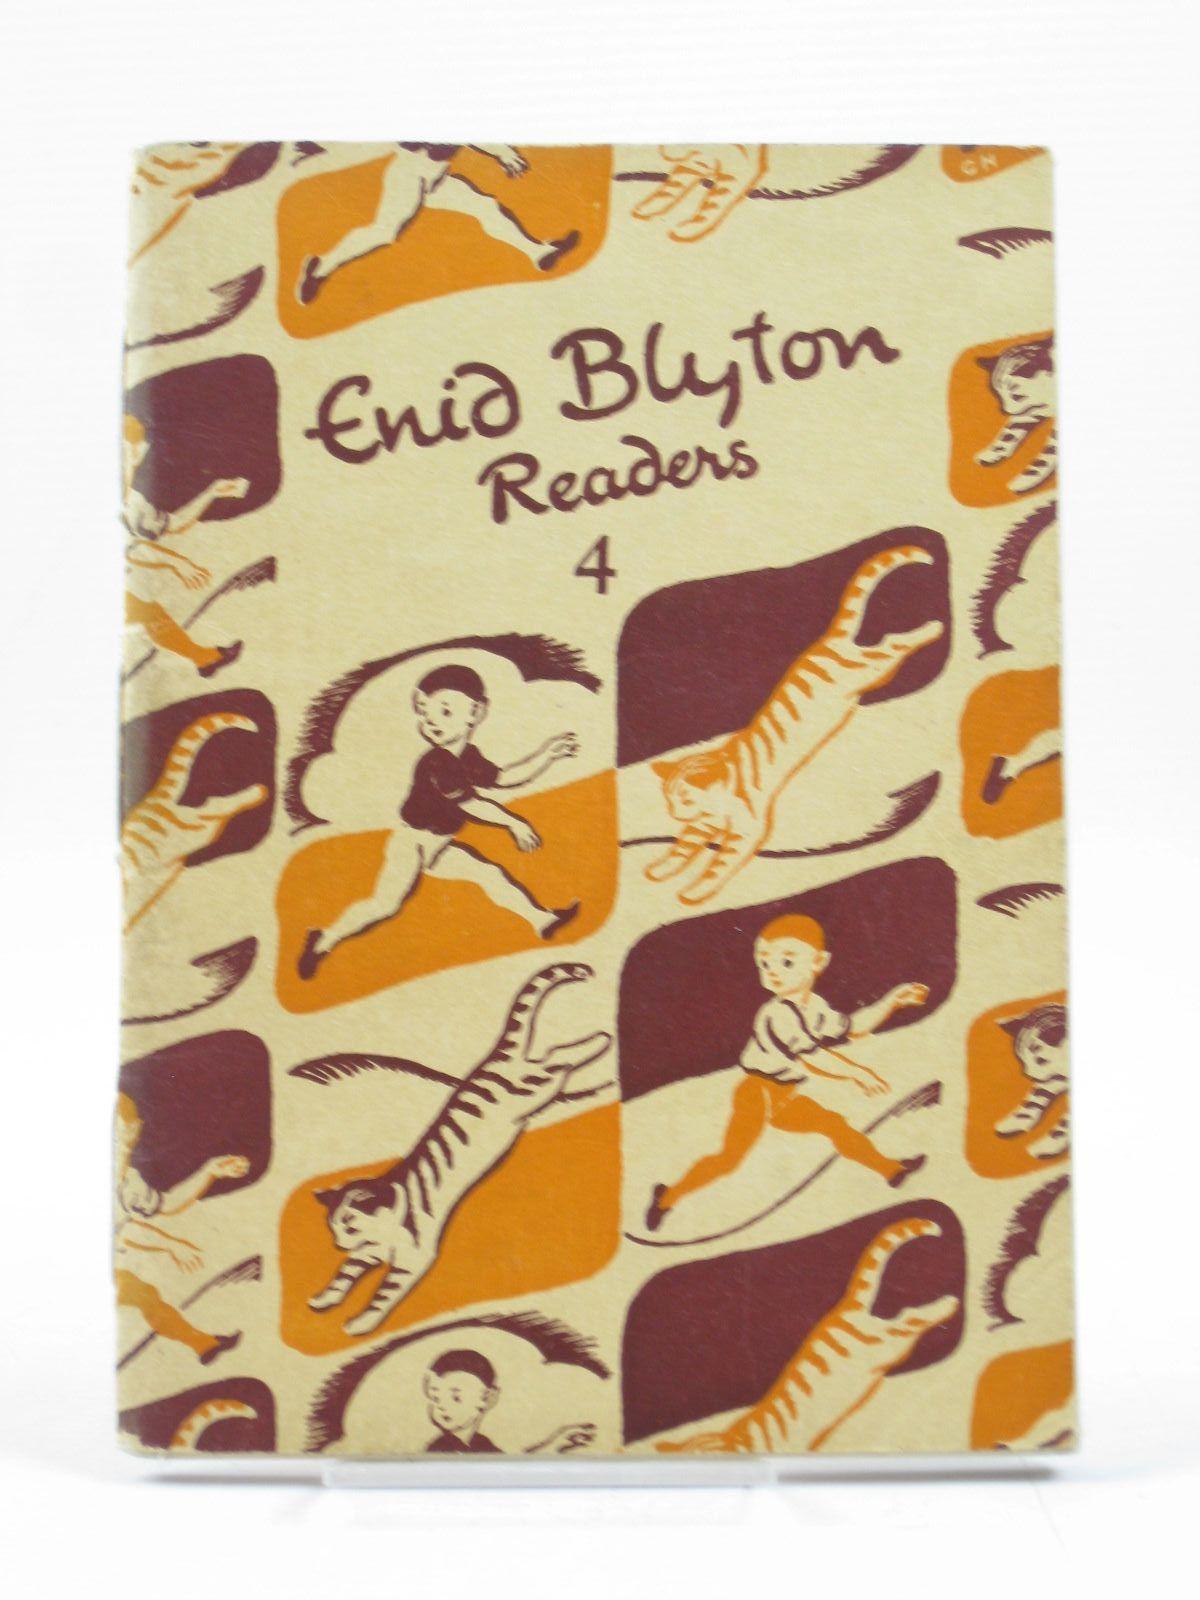 Cover of ENID BLYTON READERS 4 by Enid Blyton